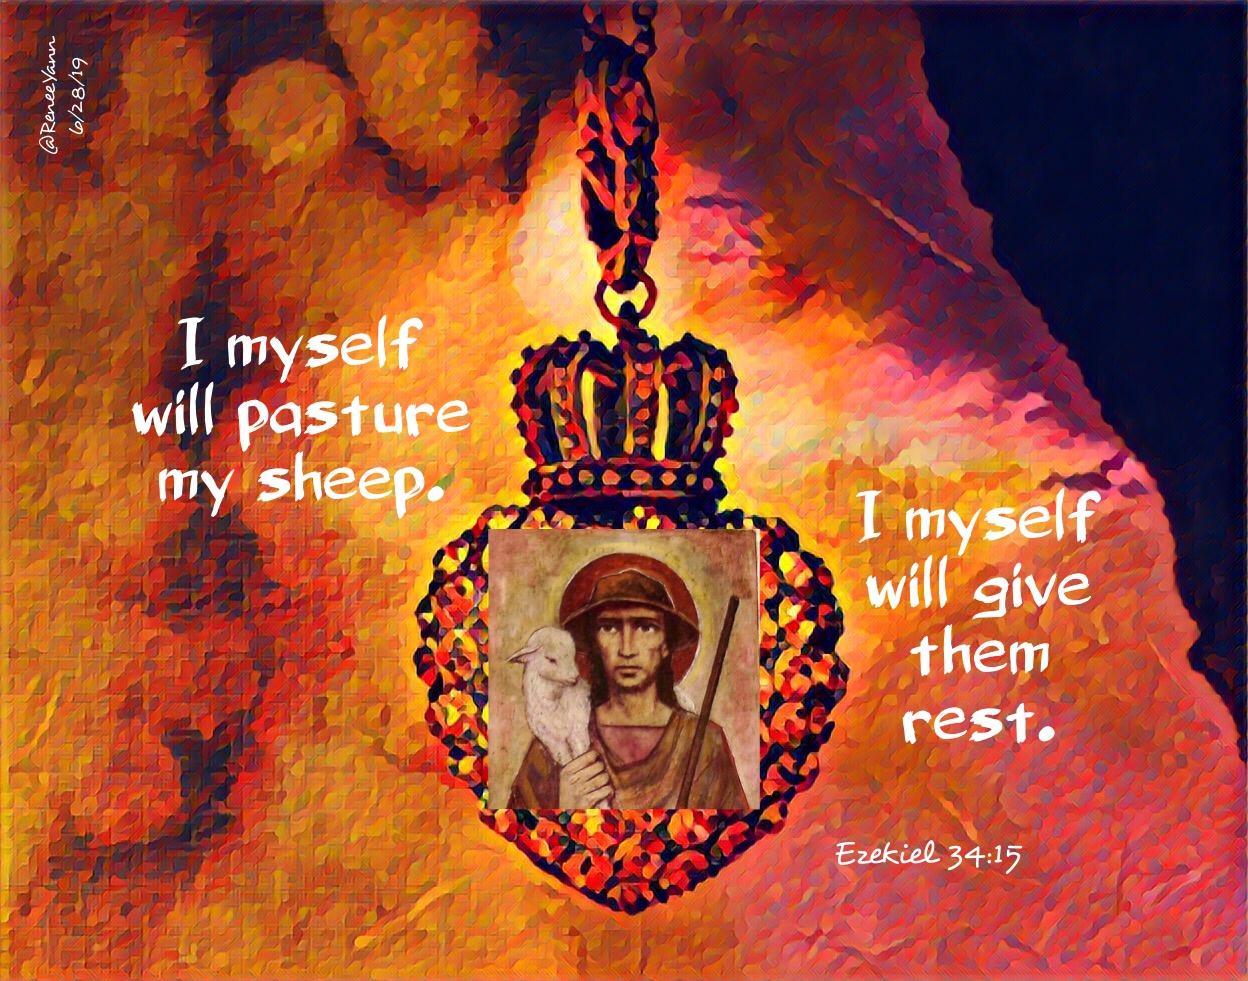 Ez34_15 shepherd